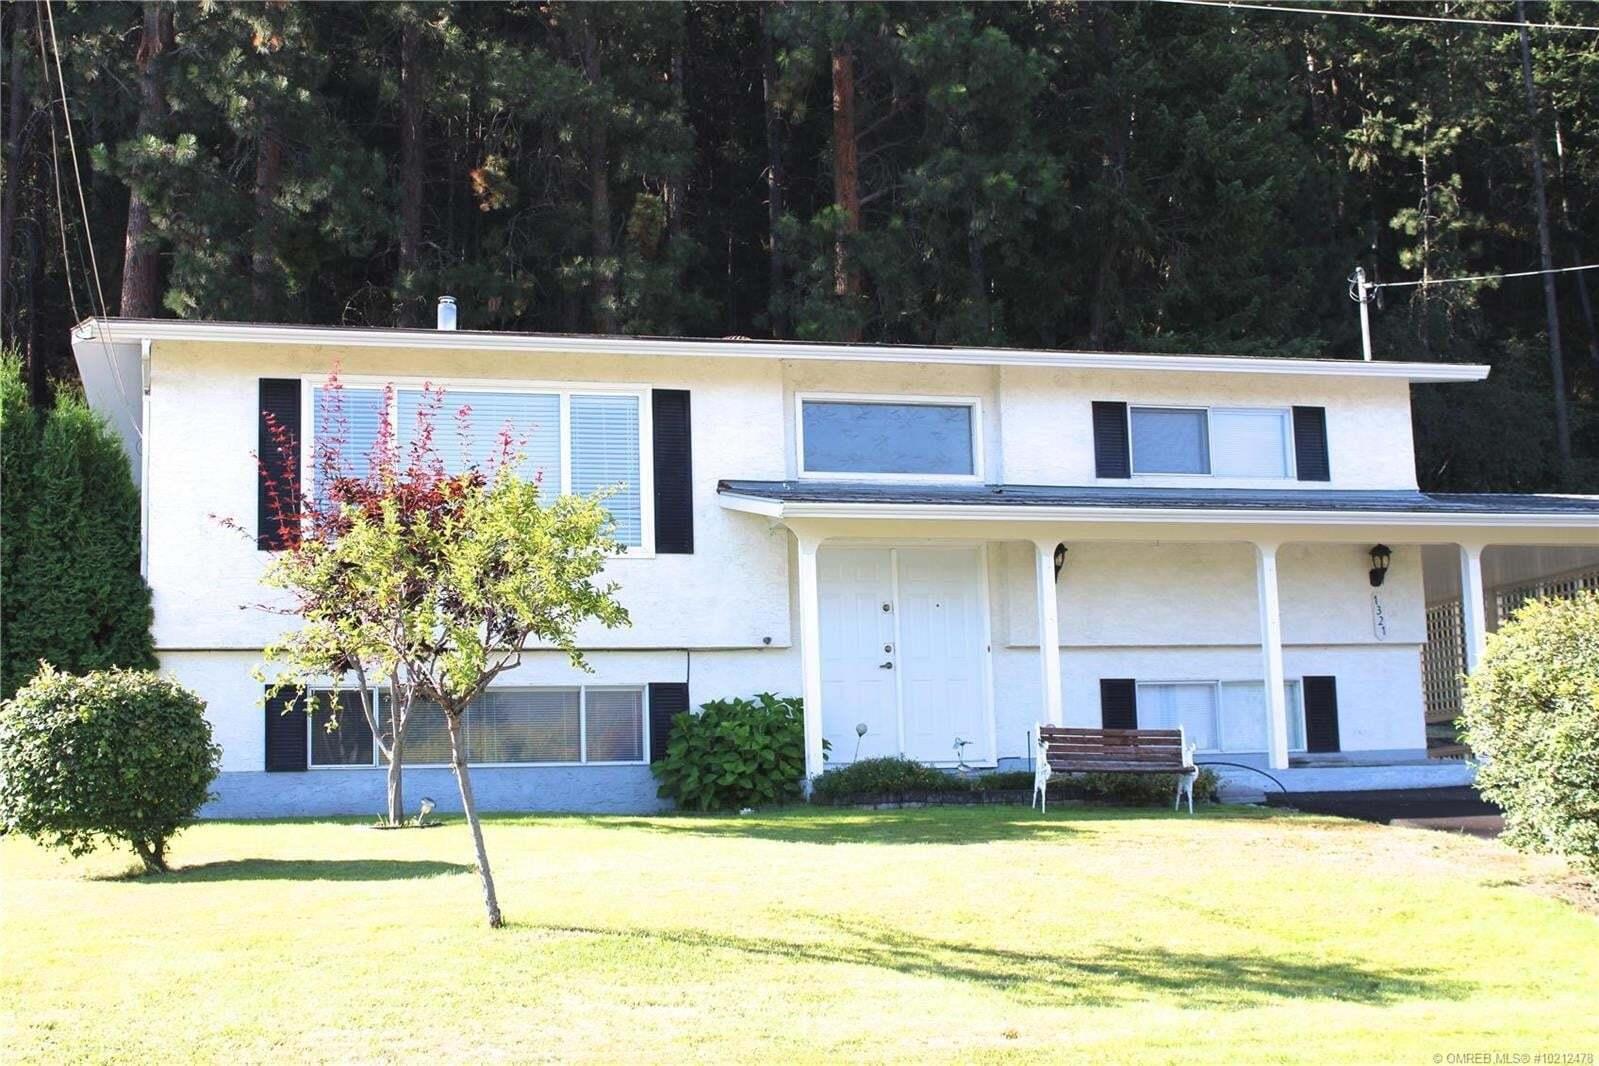 House for sale at 1321 Ponderosa Rd West Kelowna British Columbia - MLS: 10212478